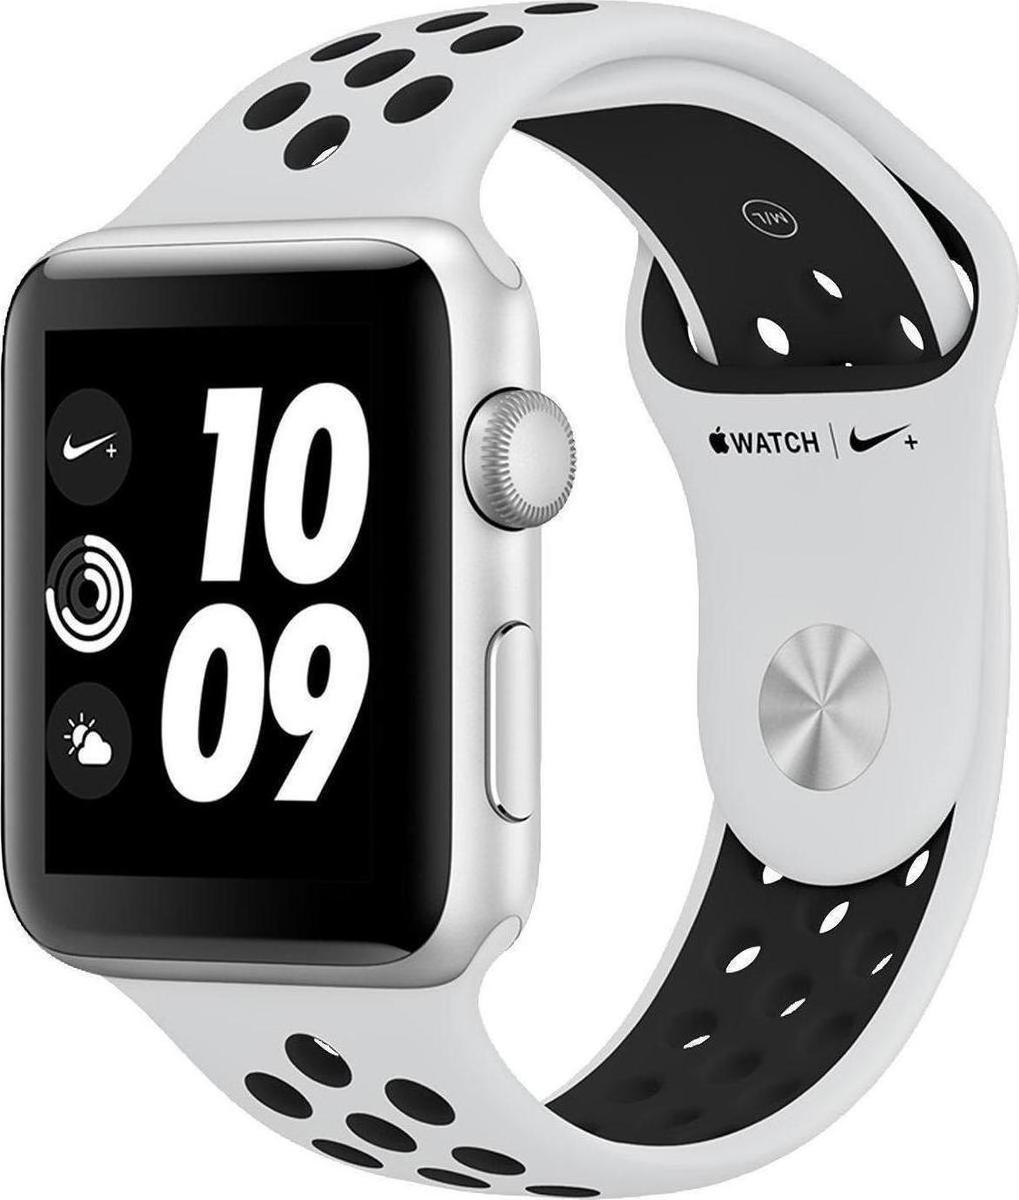 Apple Watch Series 3 Nike+ 42mm Aluminium Silver Platinum Black Plastic Sport Band Πληρωμή έως 24 δόσεις